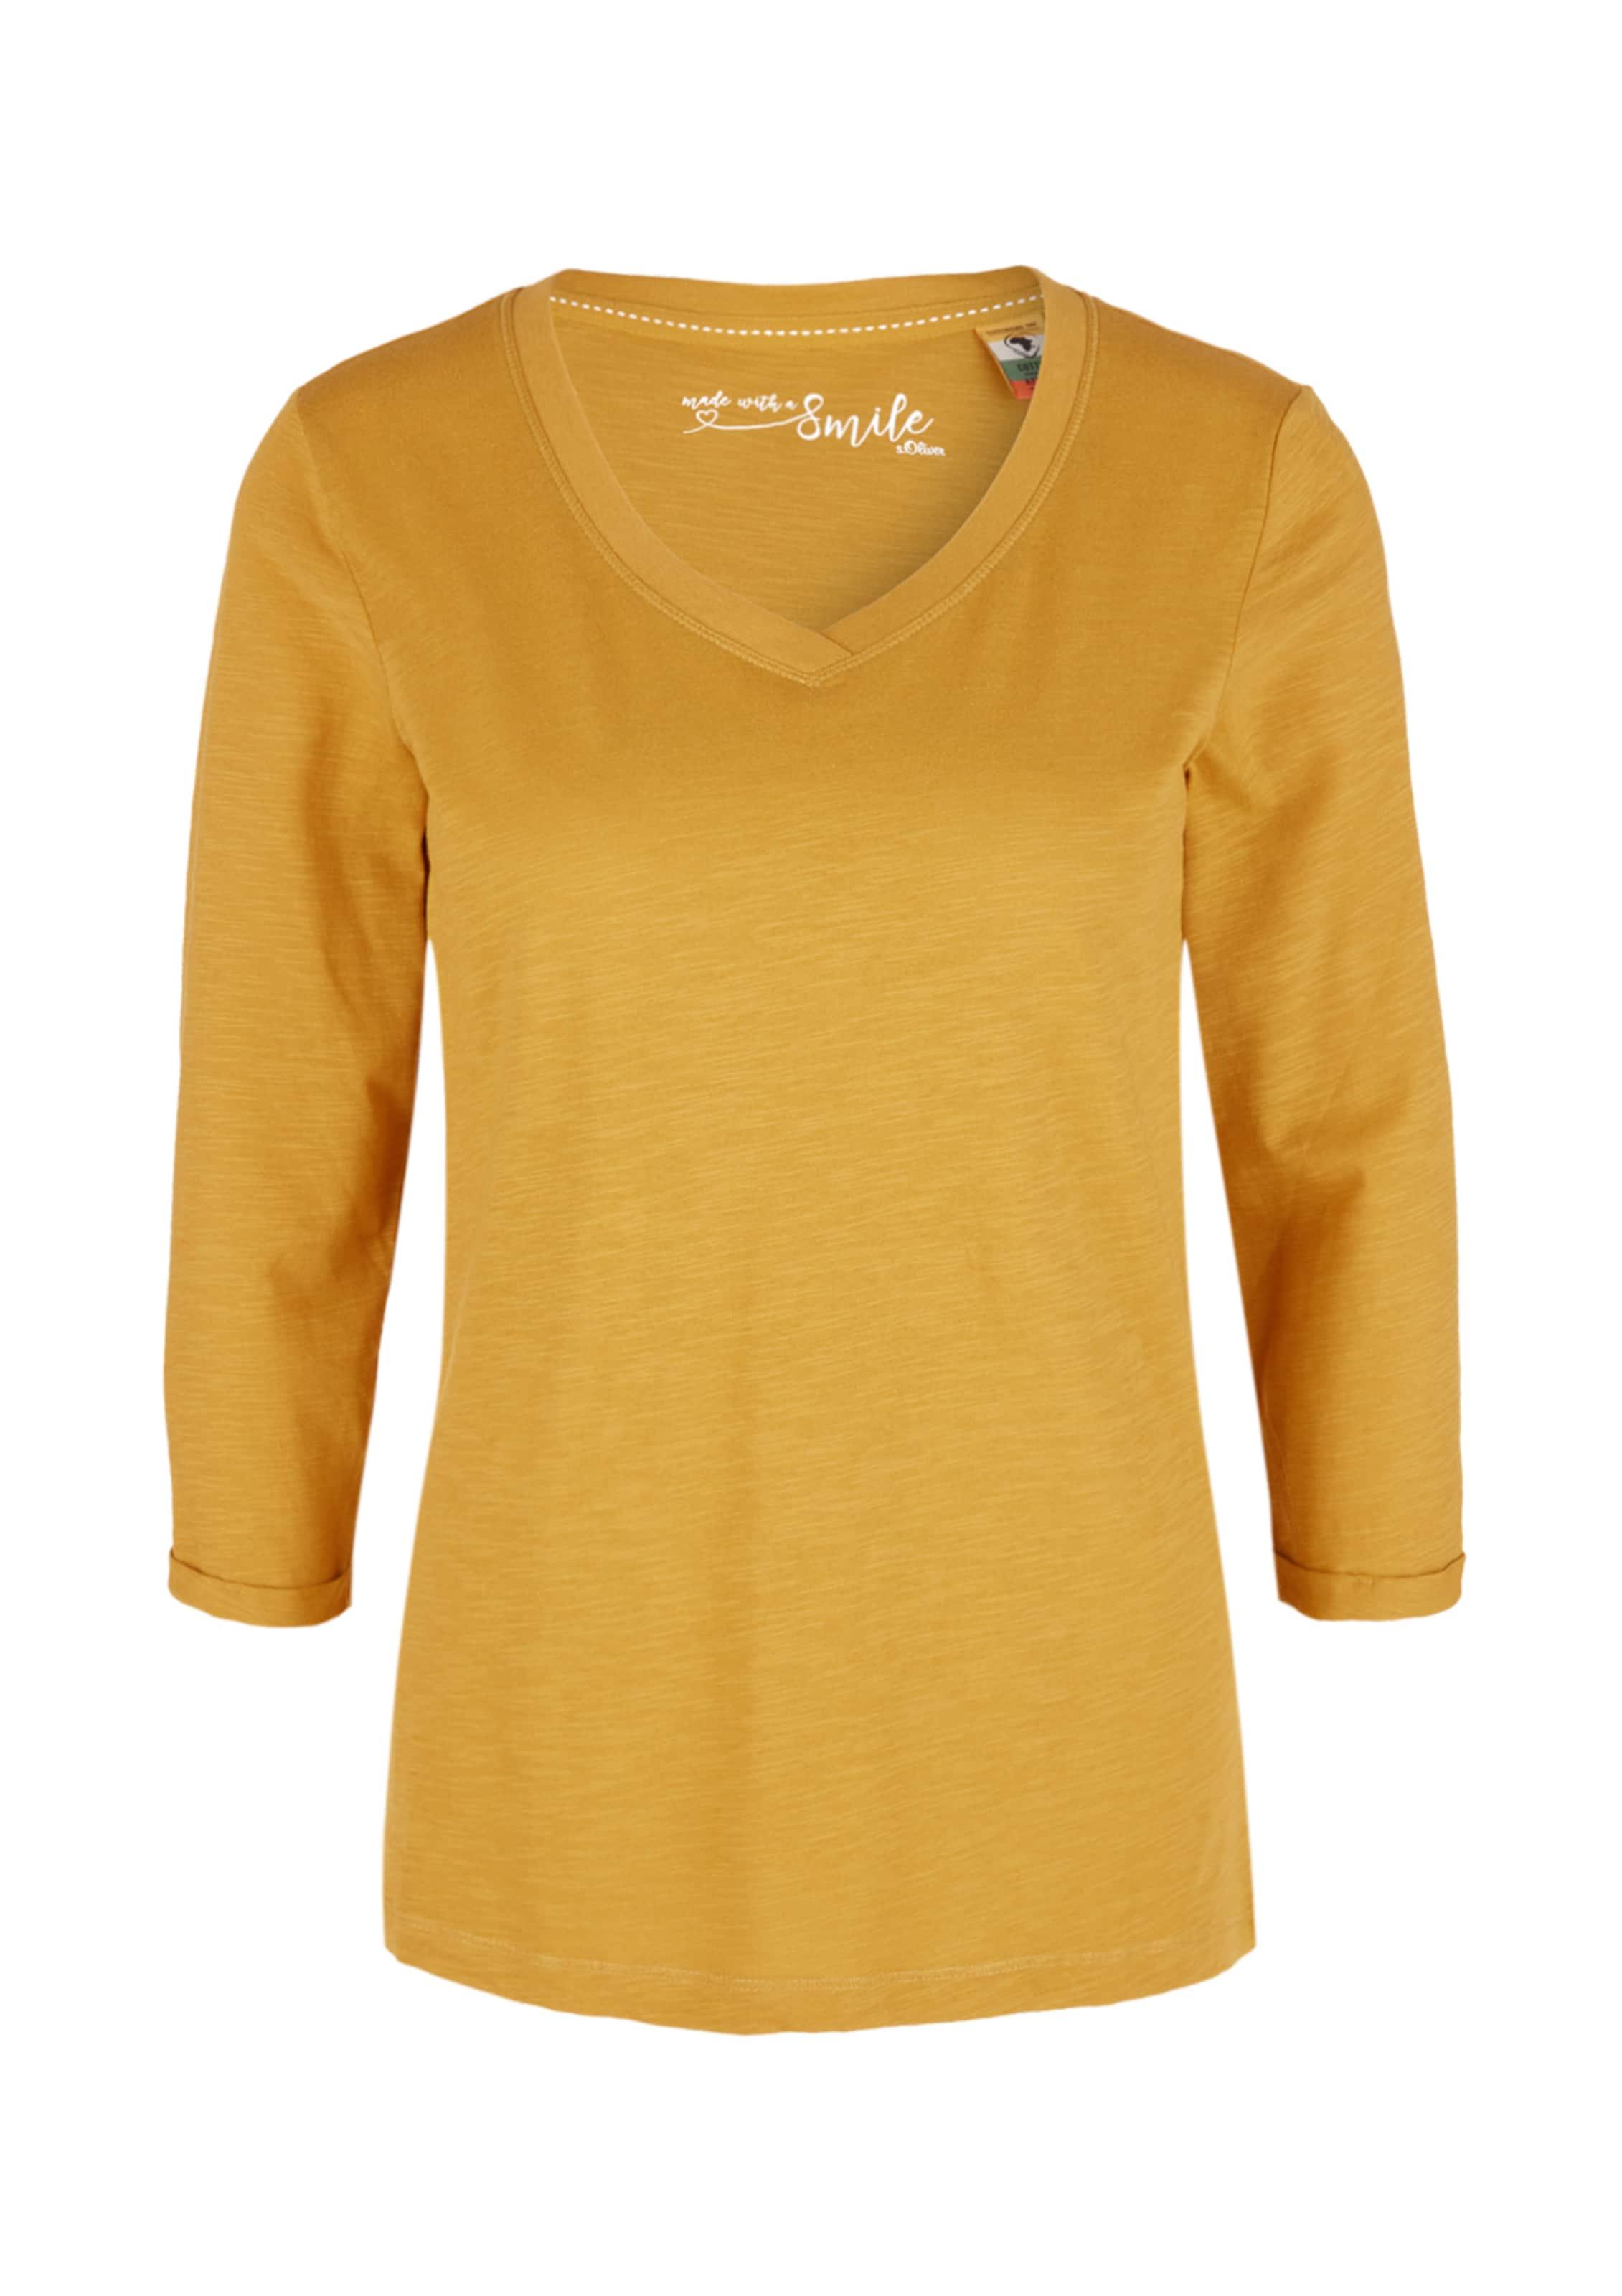 Damen S.Oliver Shirt gelb,  gold, grau,  grün,  olive | 04062033814890